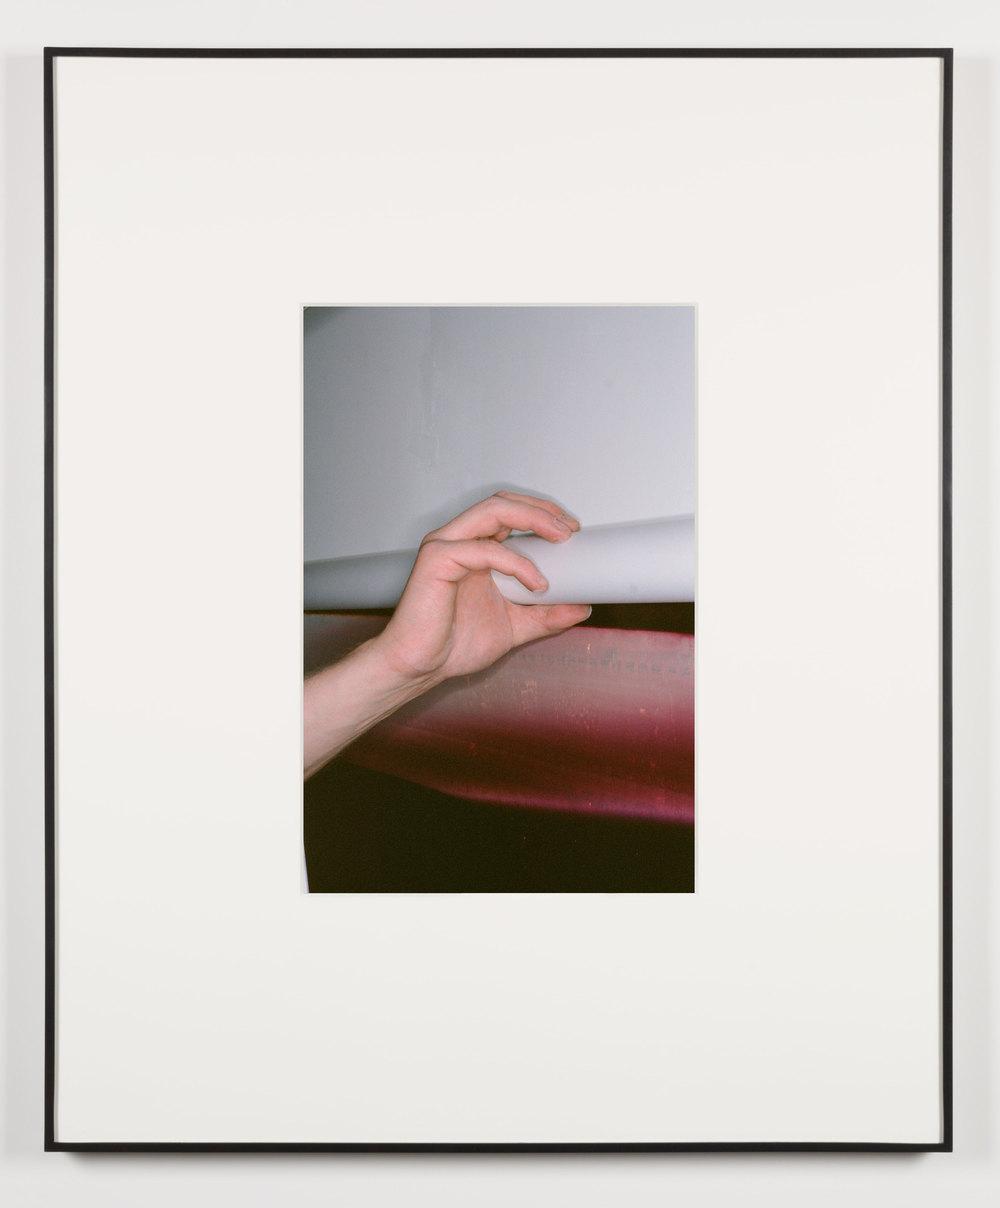 Die Technik der Eroberung (Los Angeles, California, January 14, 2014)    2014   Chromogenic print  20 x 13 1/2 inches   Art Handling, 2011–